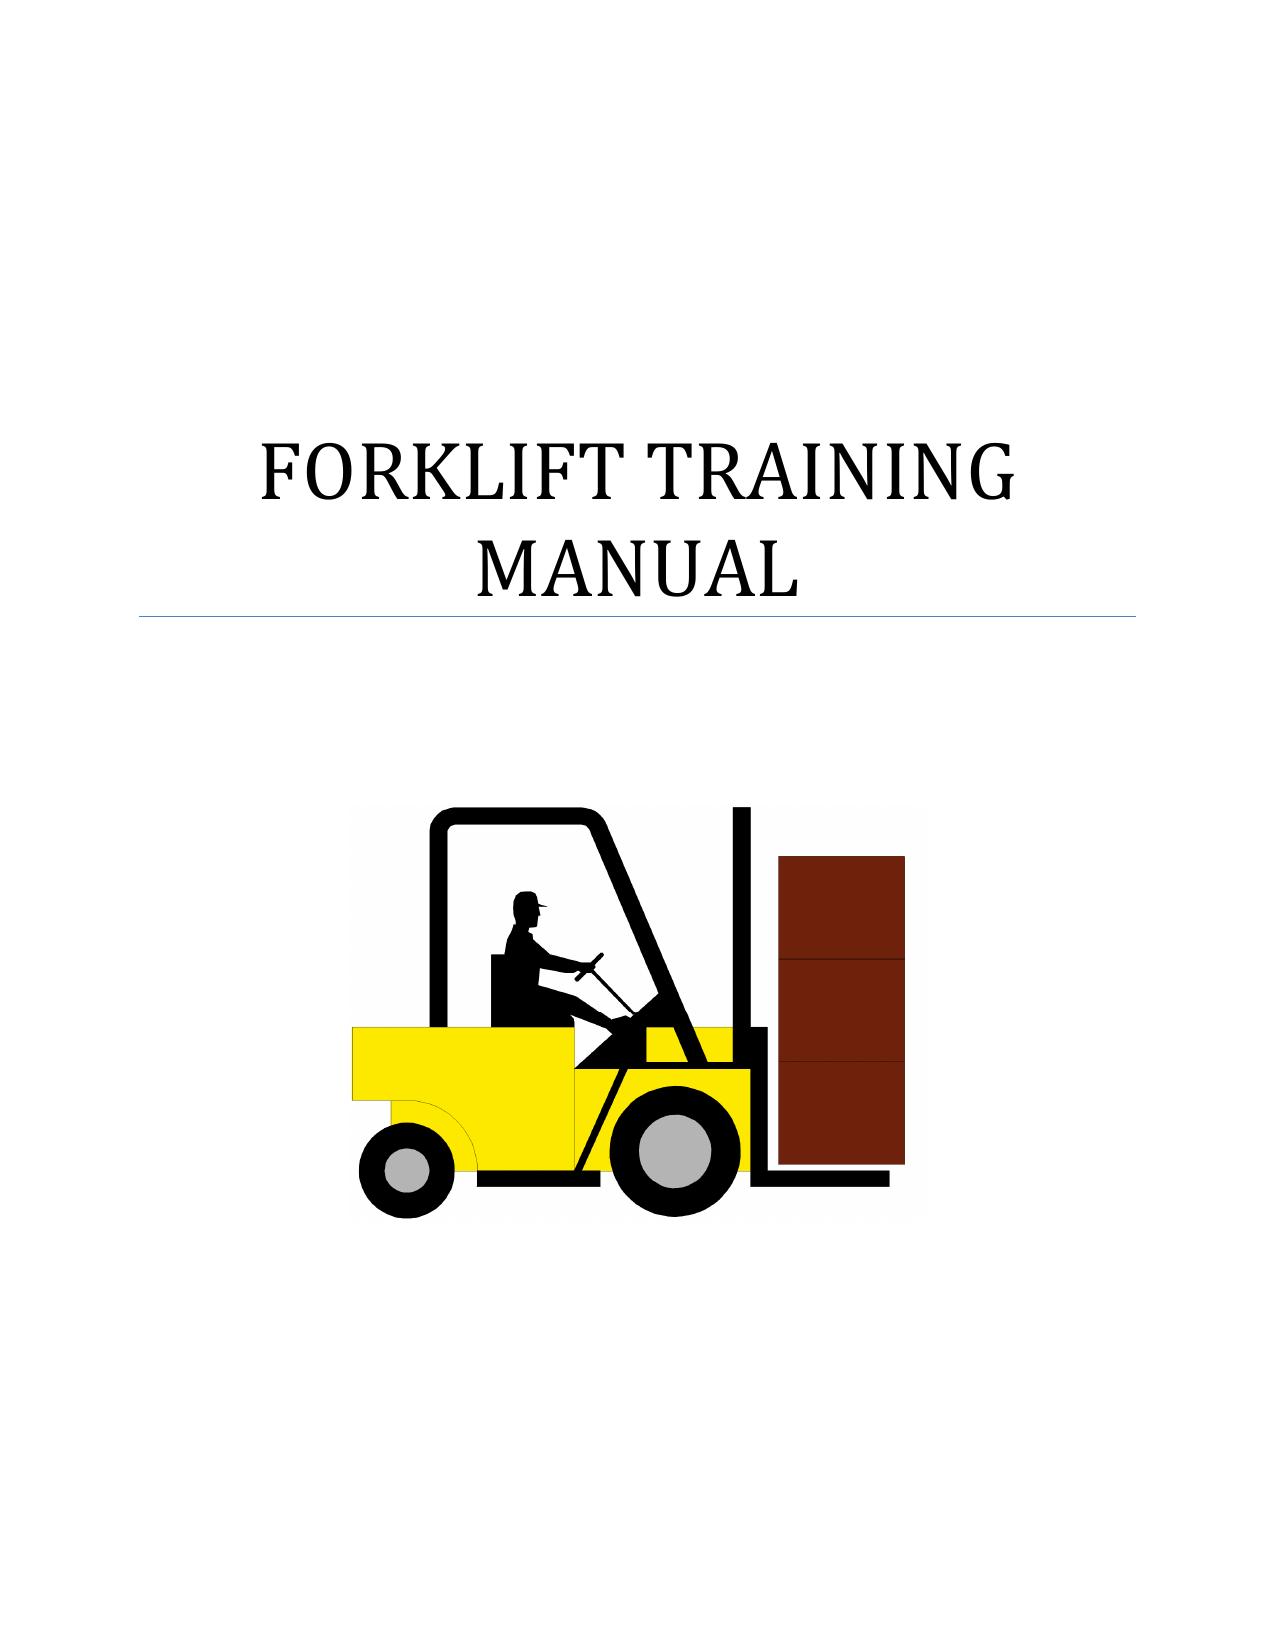 Forklift Training Manual